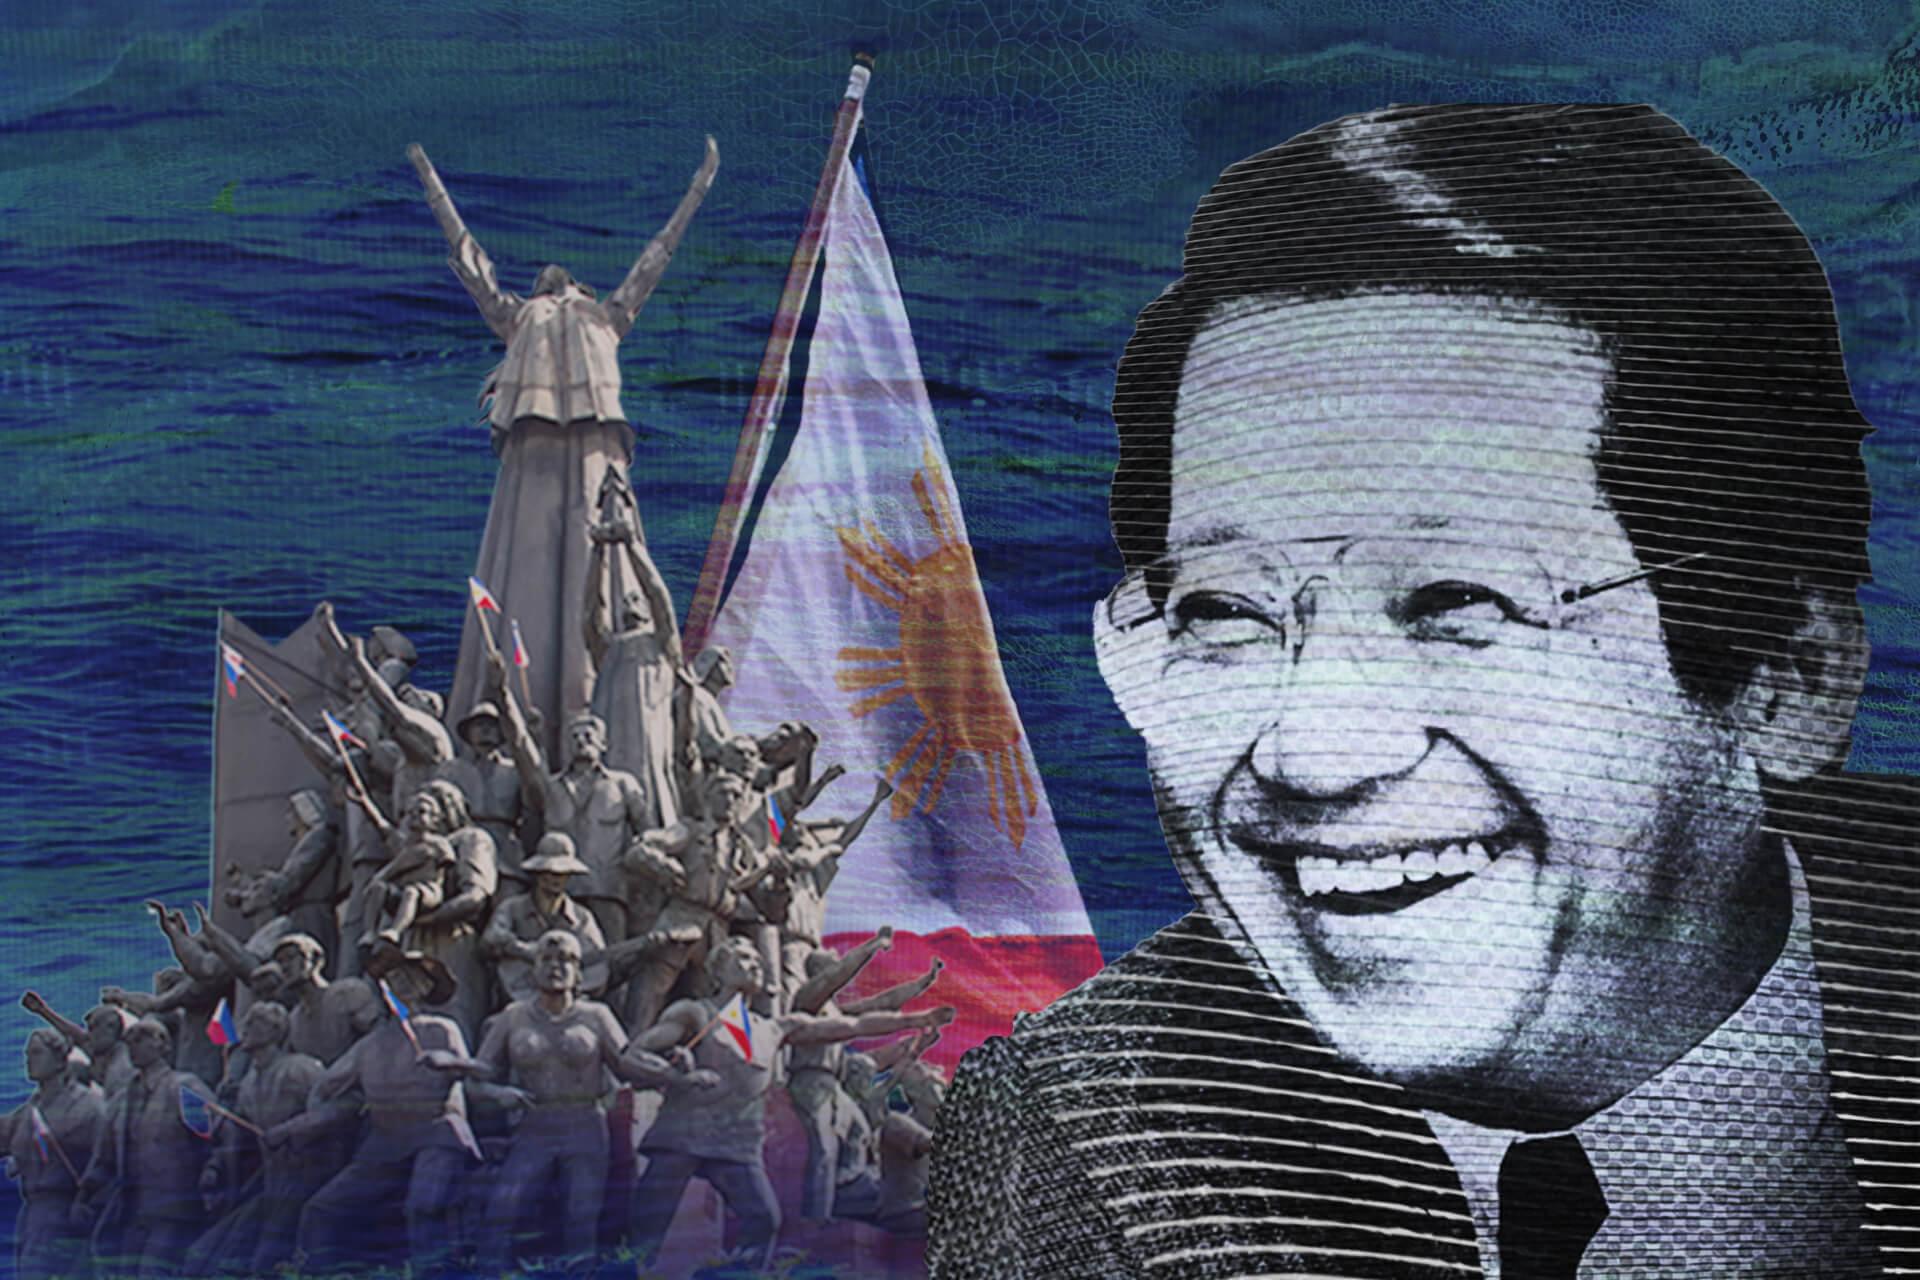 Ninoy Aquino collage by Gabby Jimenez